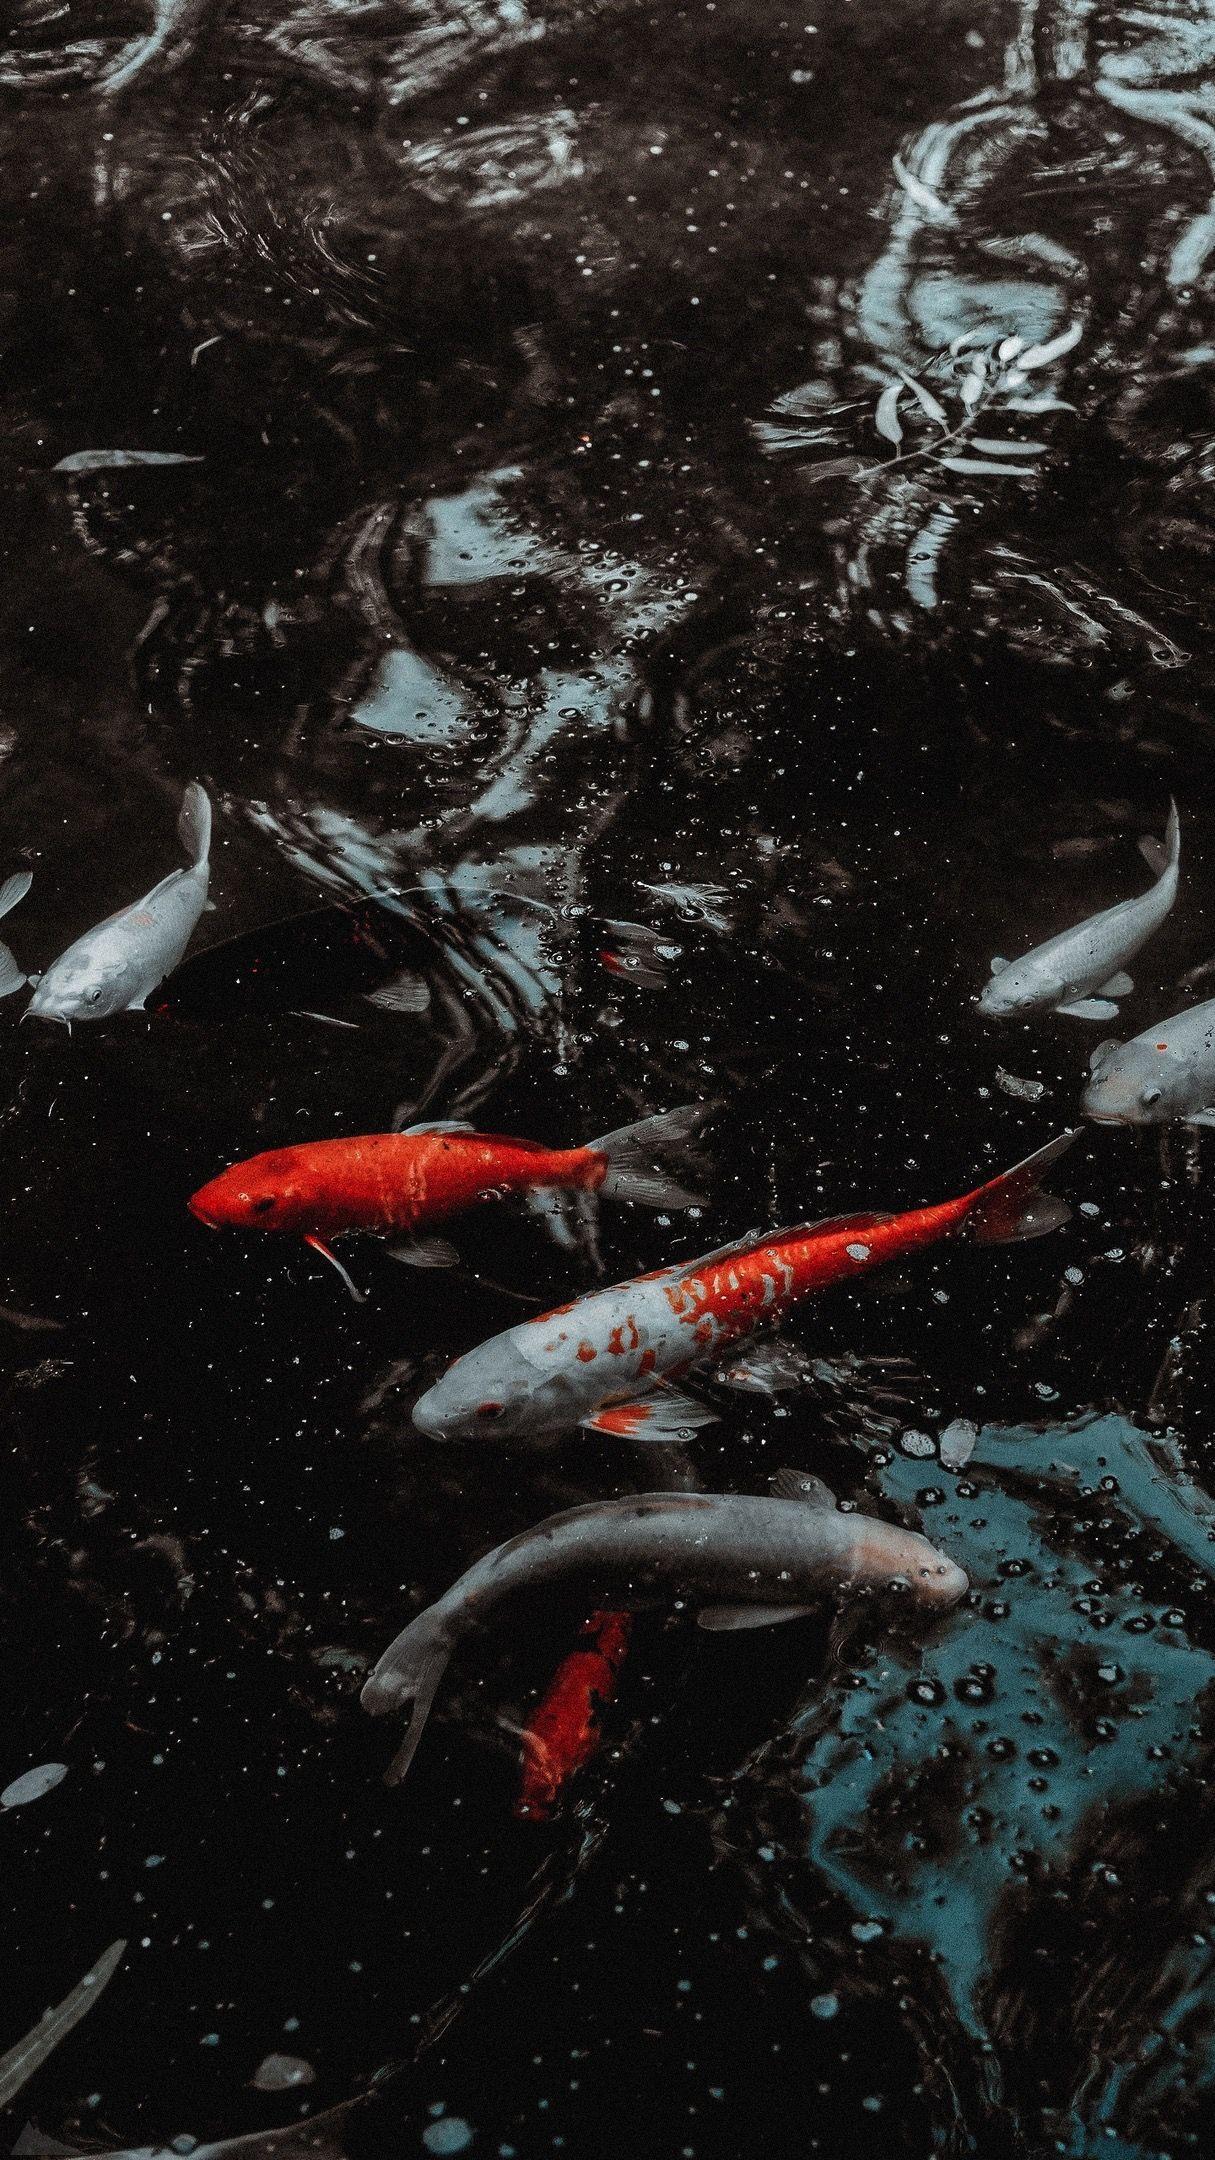 Animal Wallpaper Ipad Background Fish In 2020 Fish Wallpaper Yin Yang Koi Ipad Mini Wallpaper